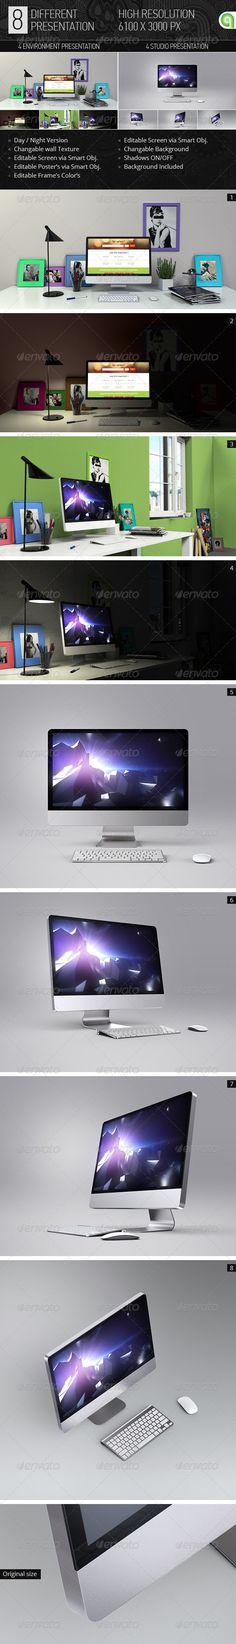 Desktop & Screen Mock-up - Monitores Displays